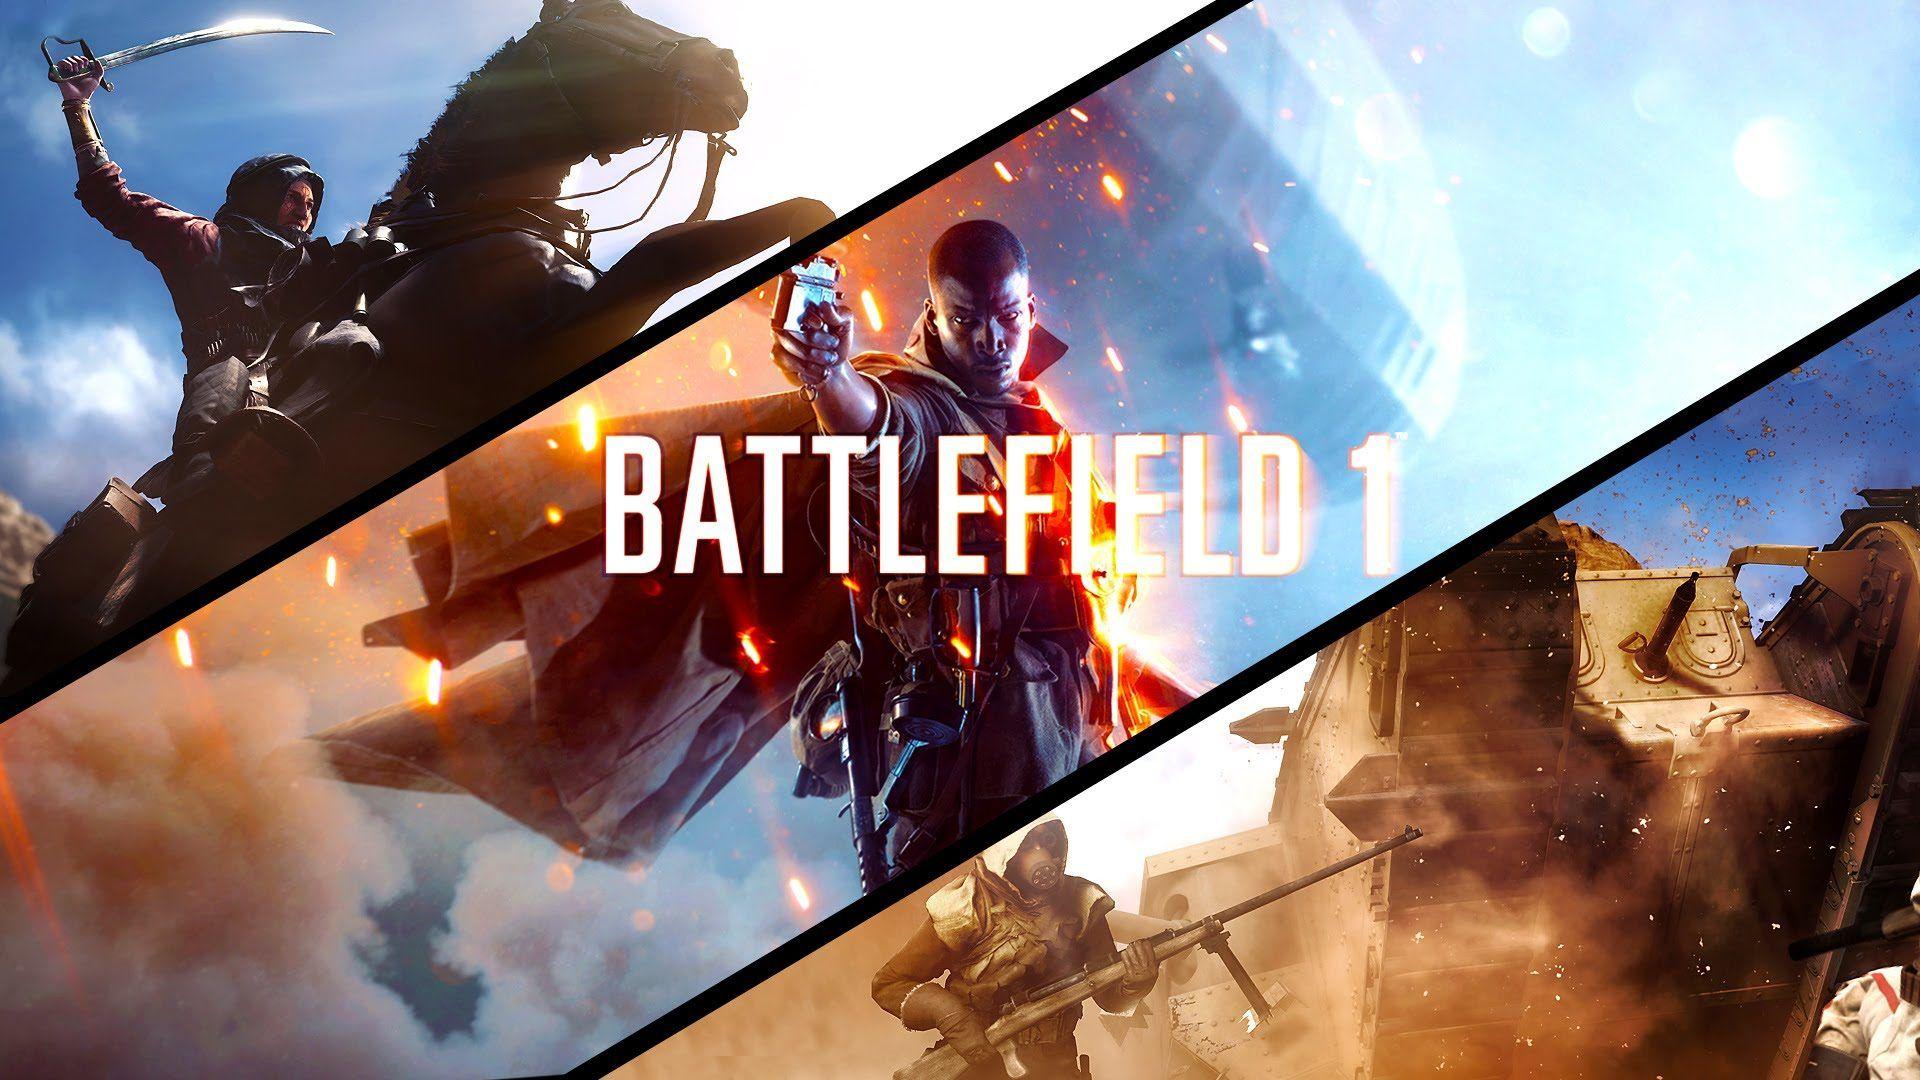 battlefield 1 hd images 6 | battlefield 1 hd images | pinterest